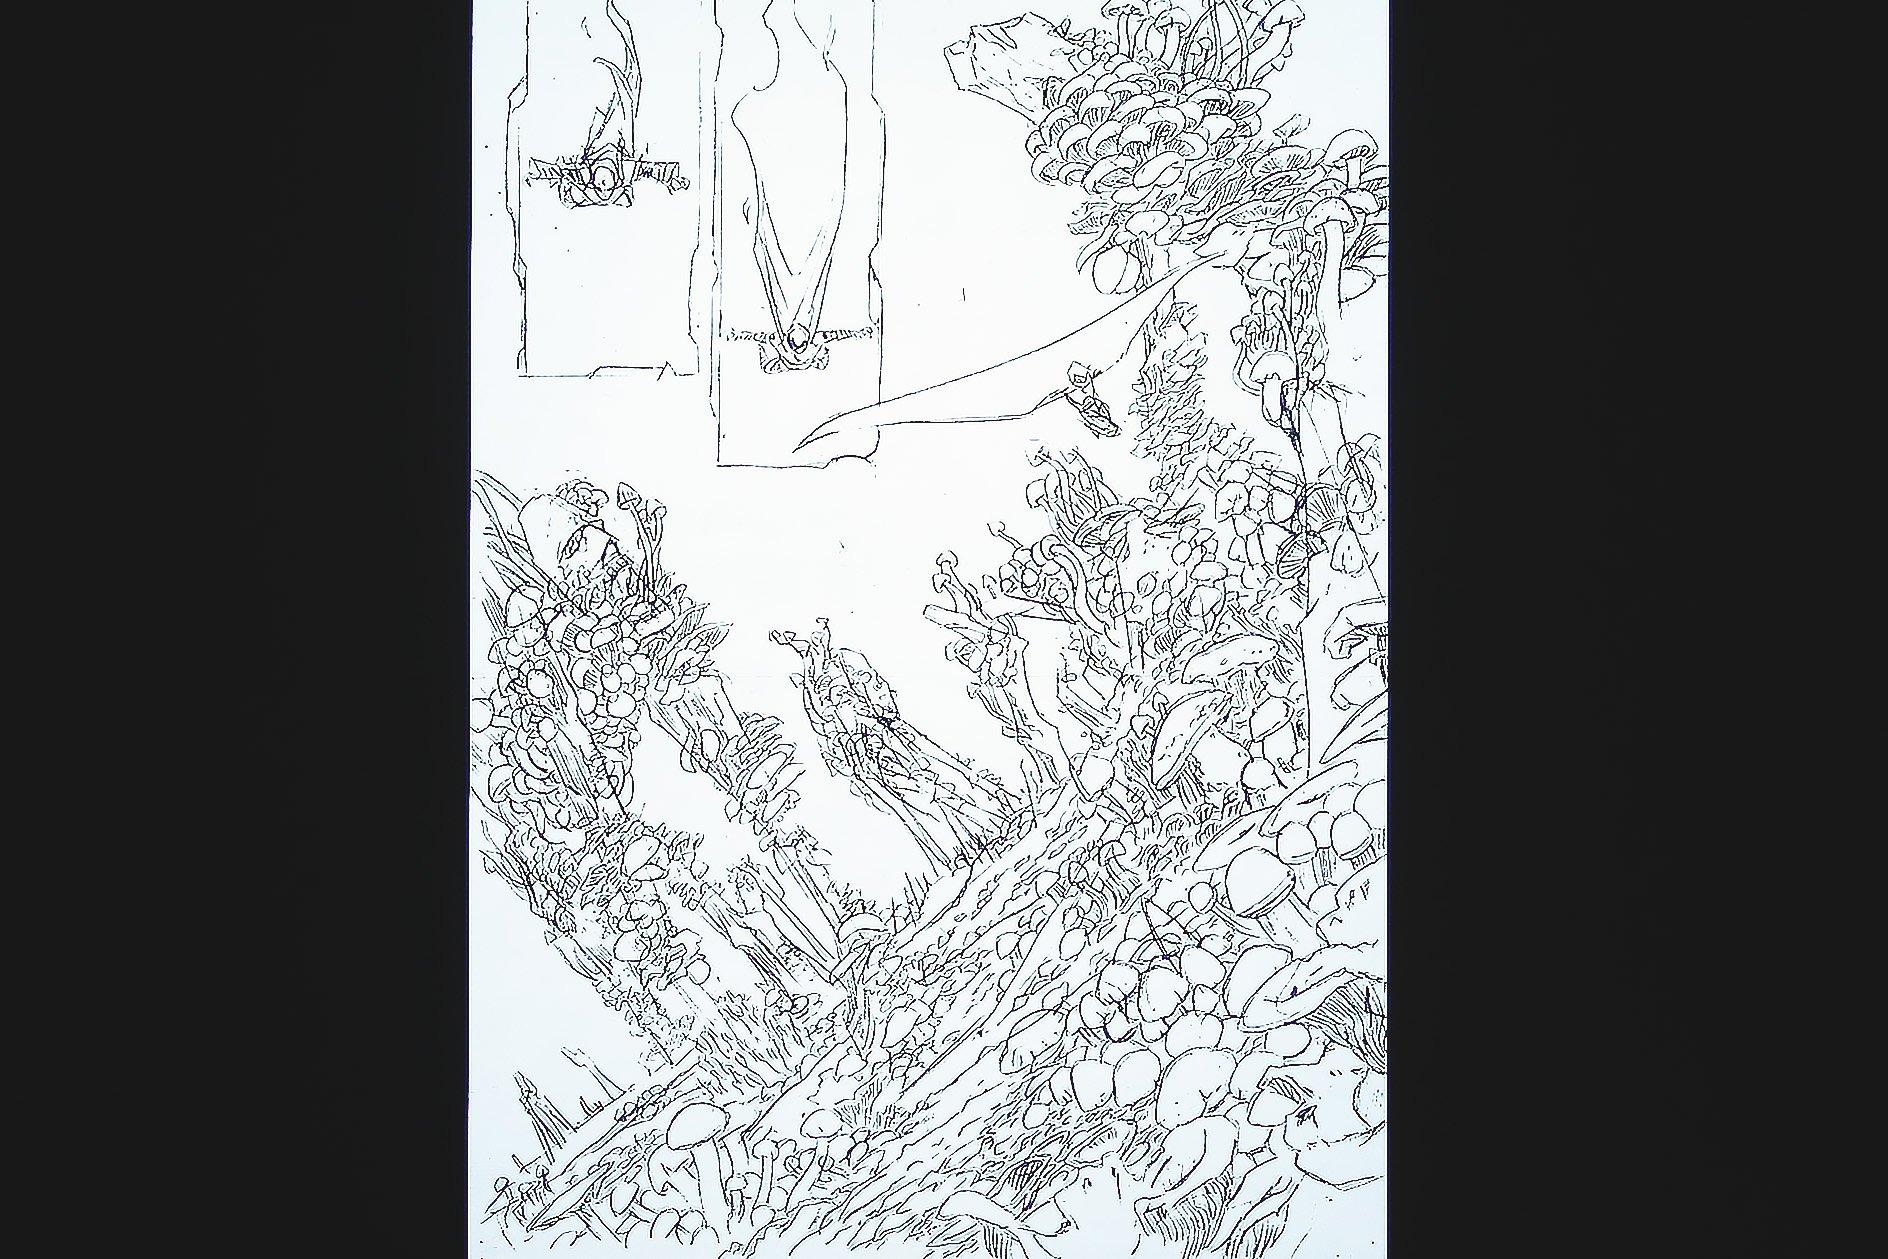 Declan Shalvey at OFFSET 2015 – Larger concept sketch